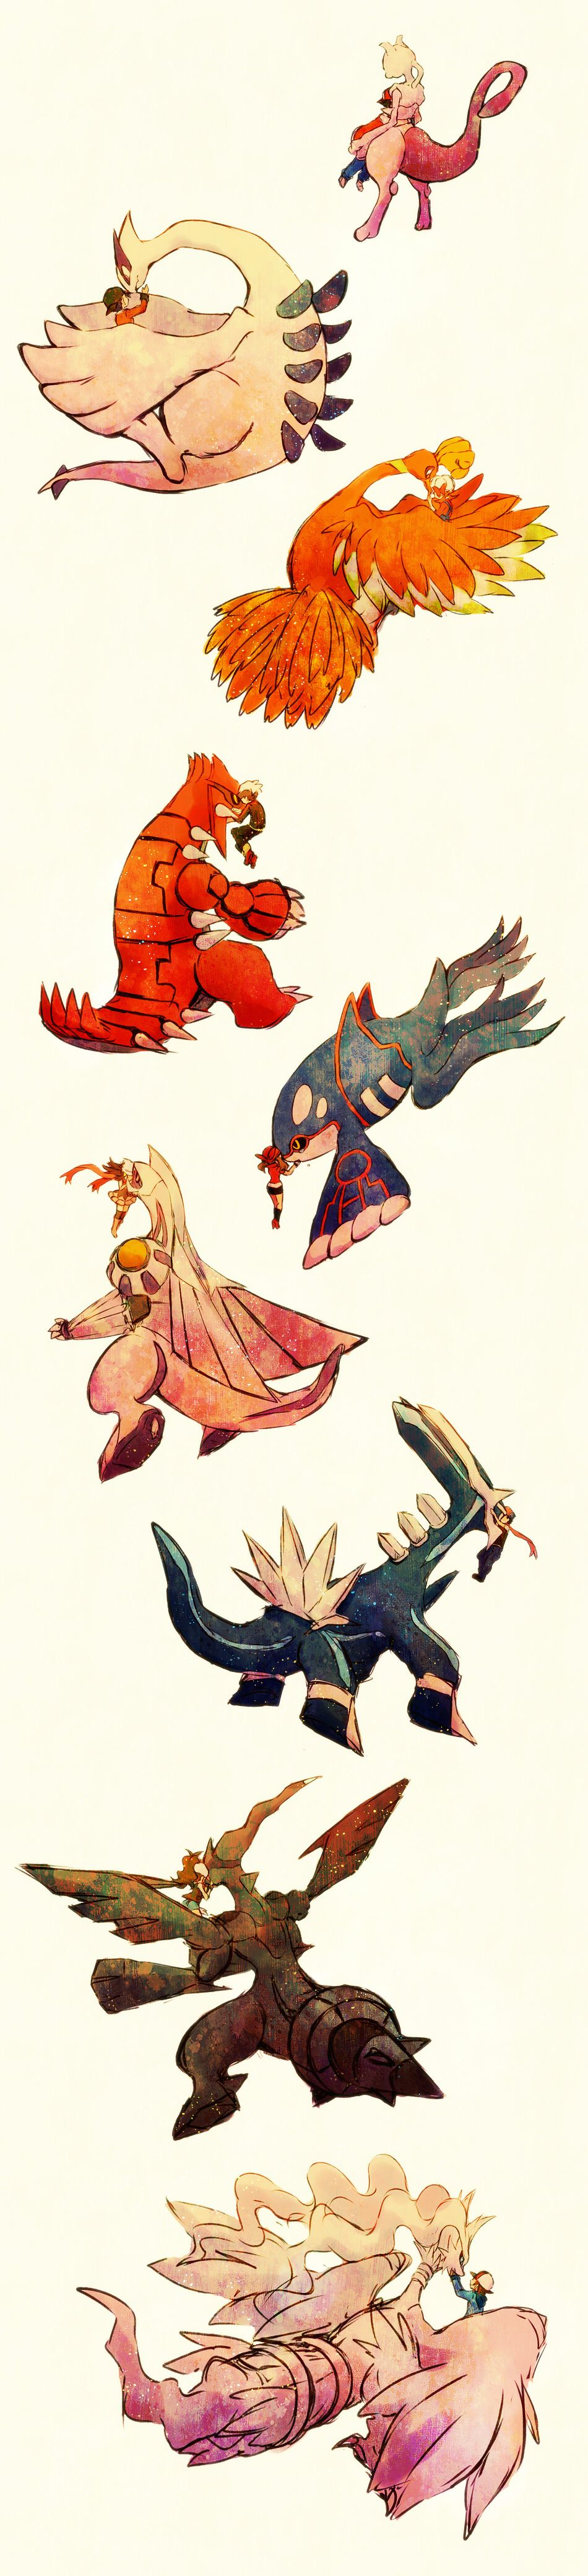 how to catch palkia in pokemon y